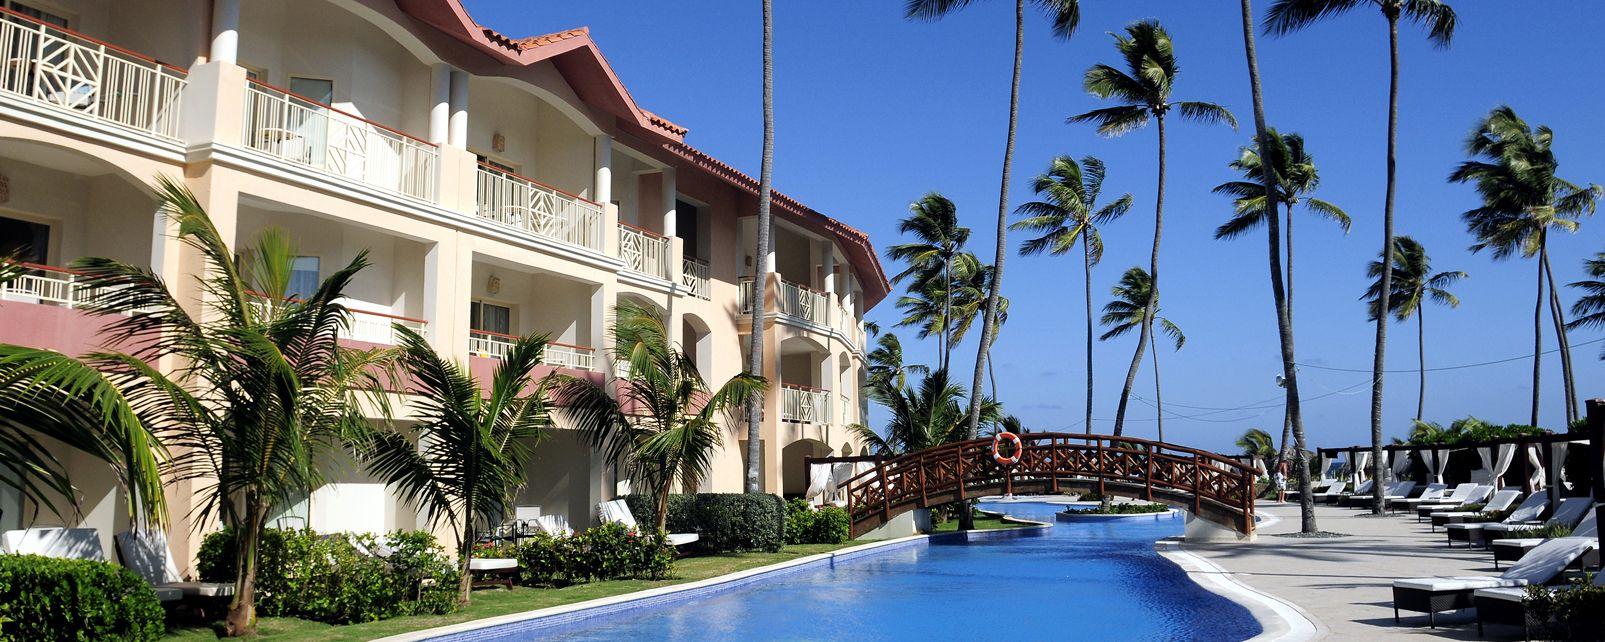 Hotel Majestic Elegance